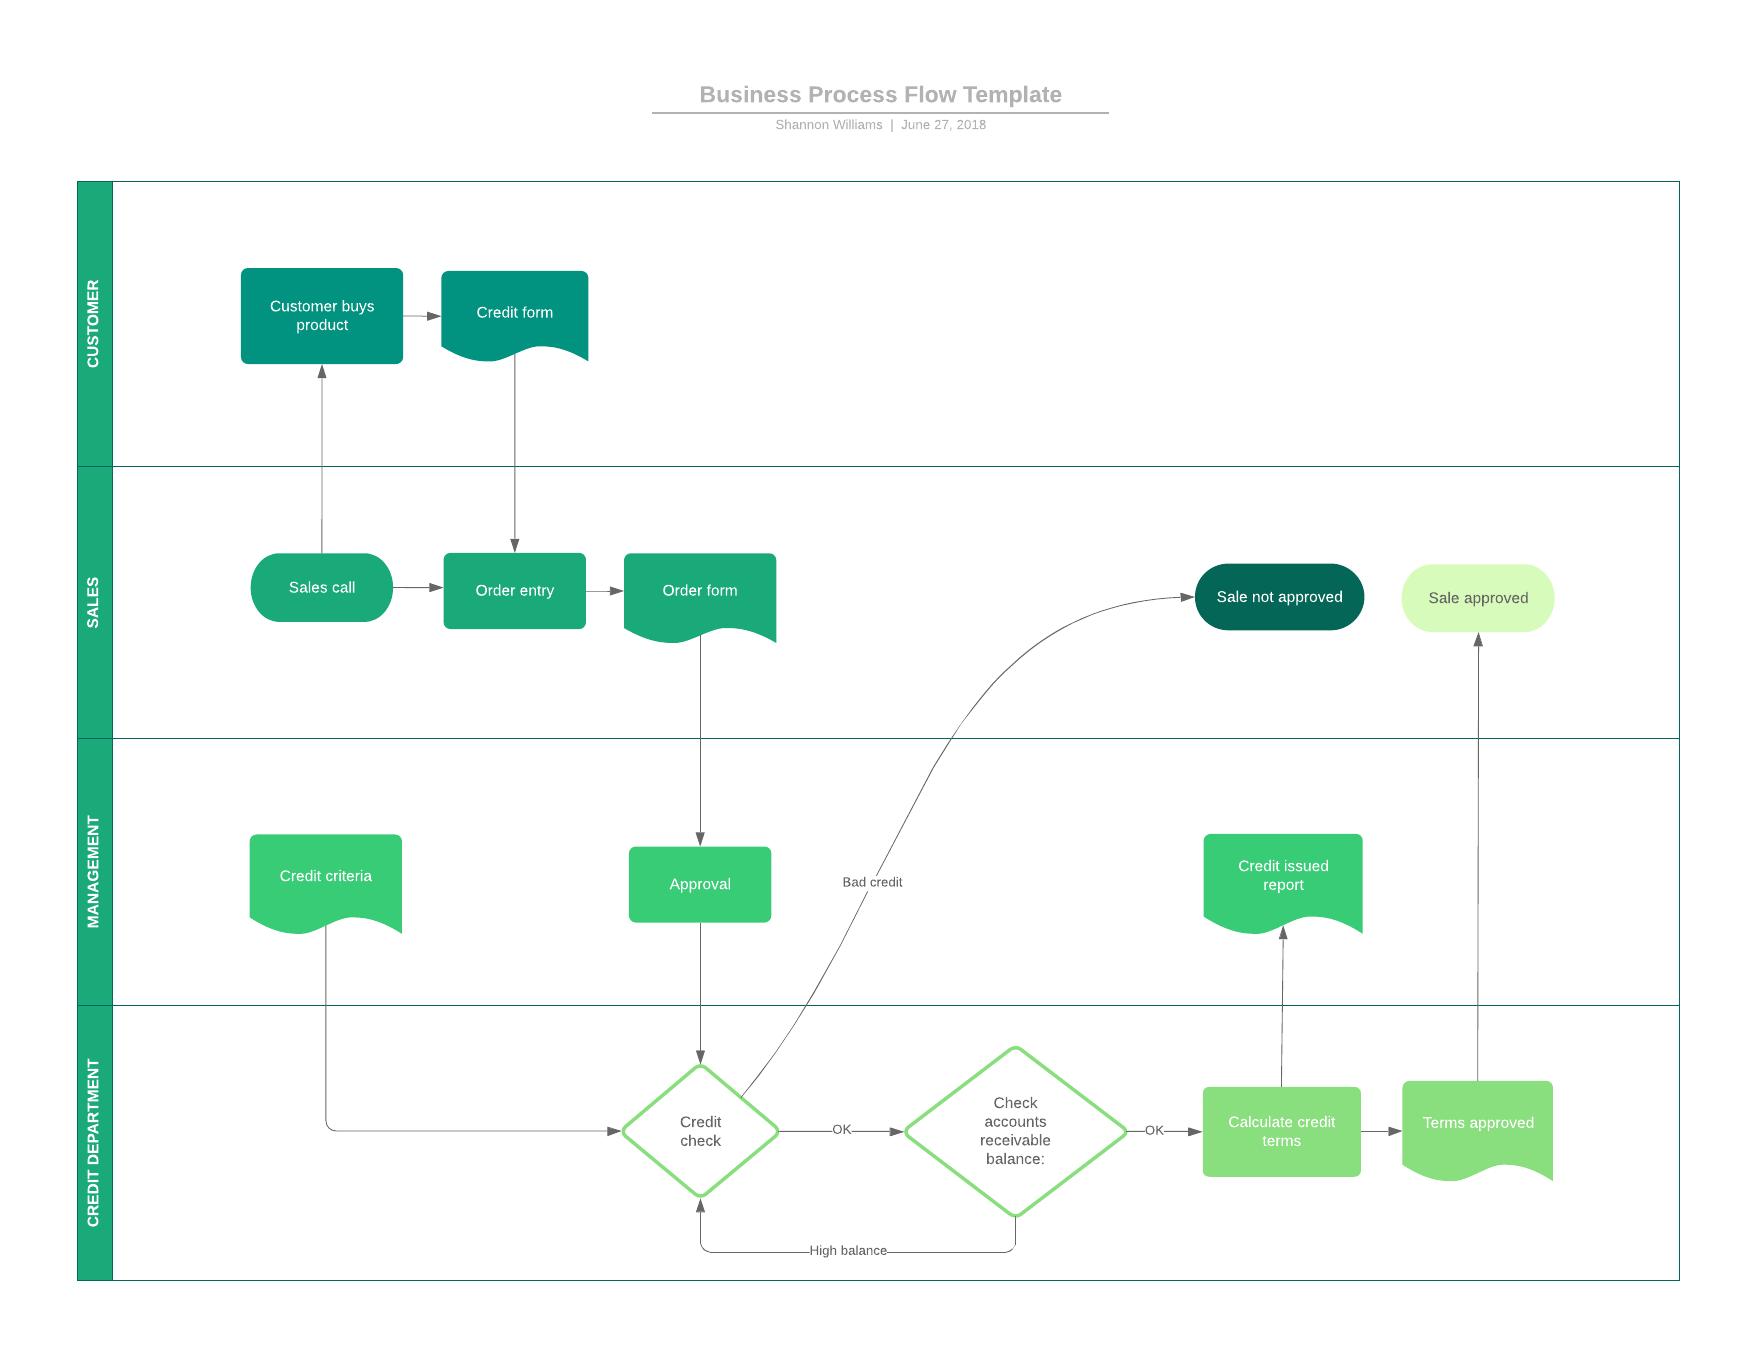 hight resolution of 9 top business analysis models lucidchart blog rh lucidchart com sample swim lane diagram sample swim lane diagram